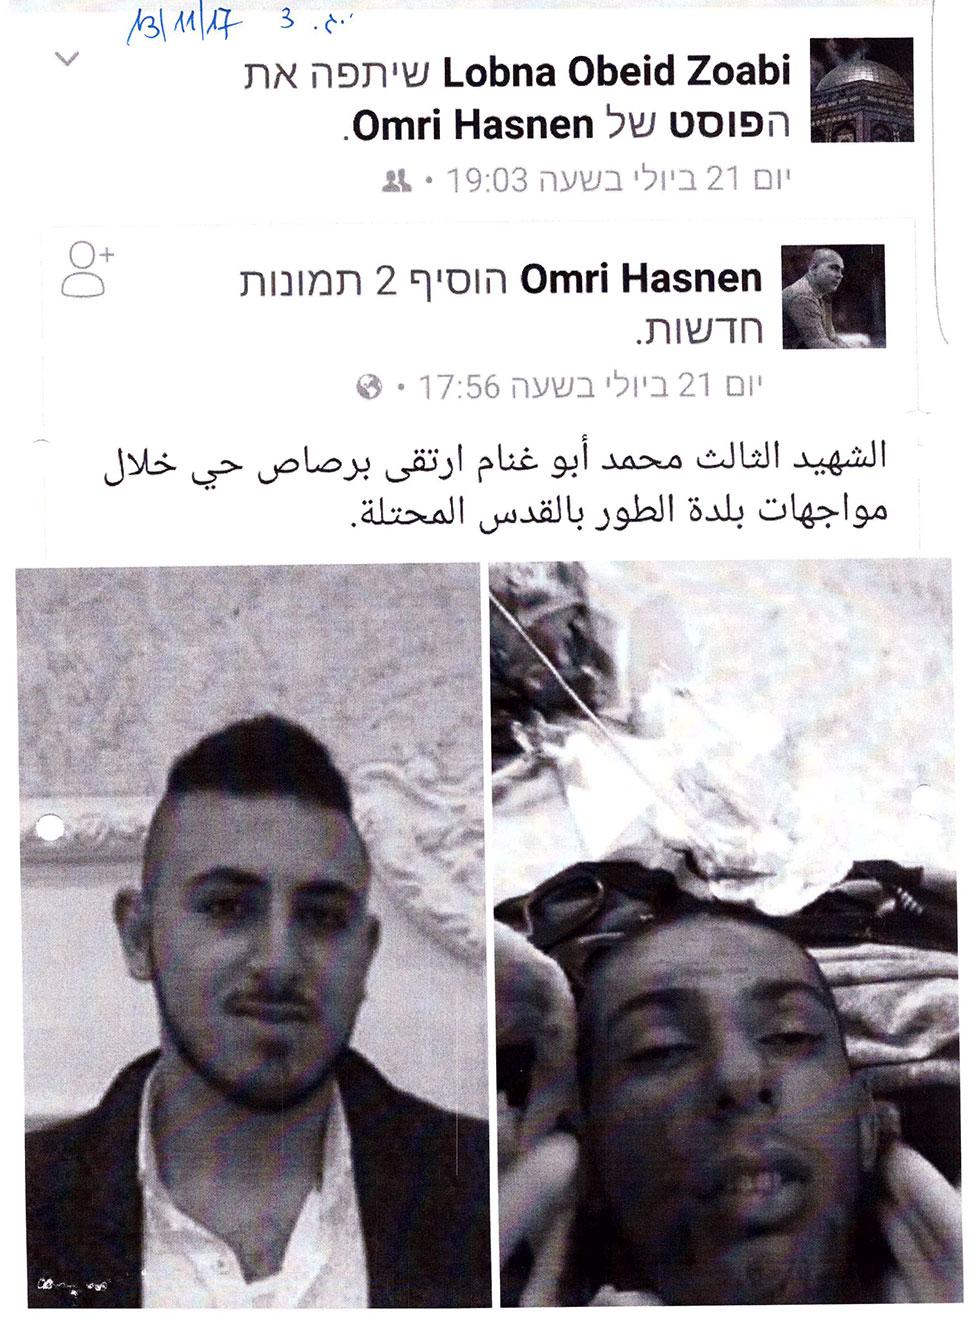 Facebook post published by Lobna Zoabi praising the Border Policemen killers